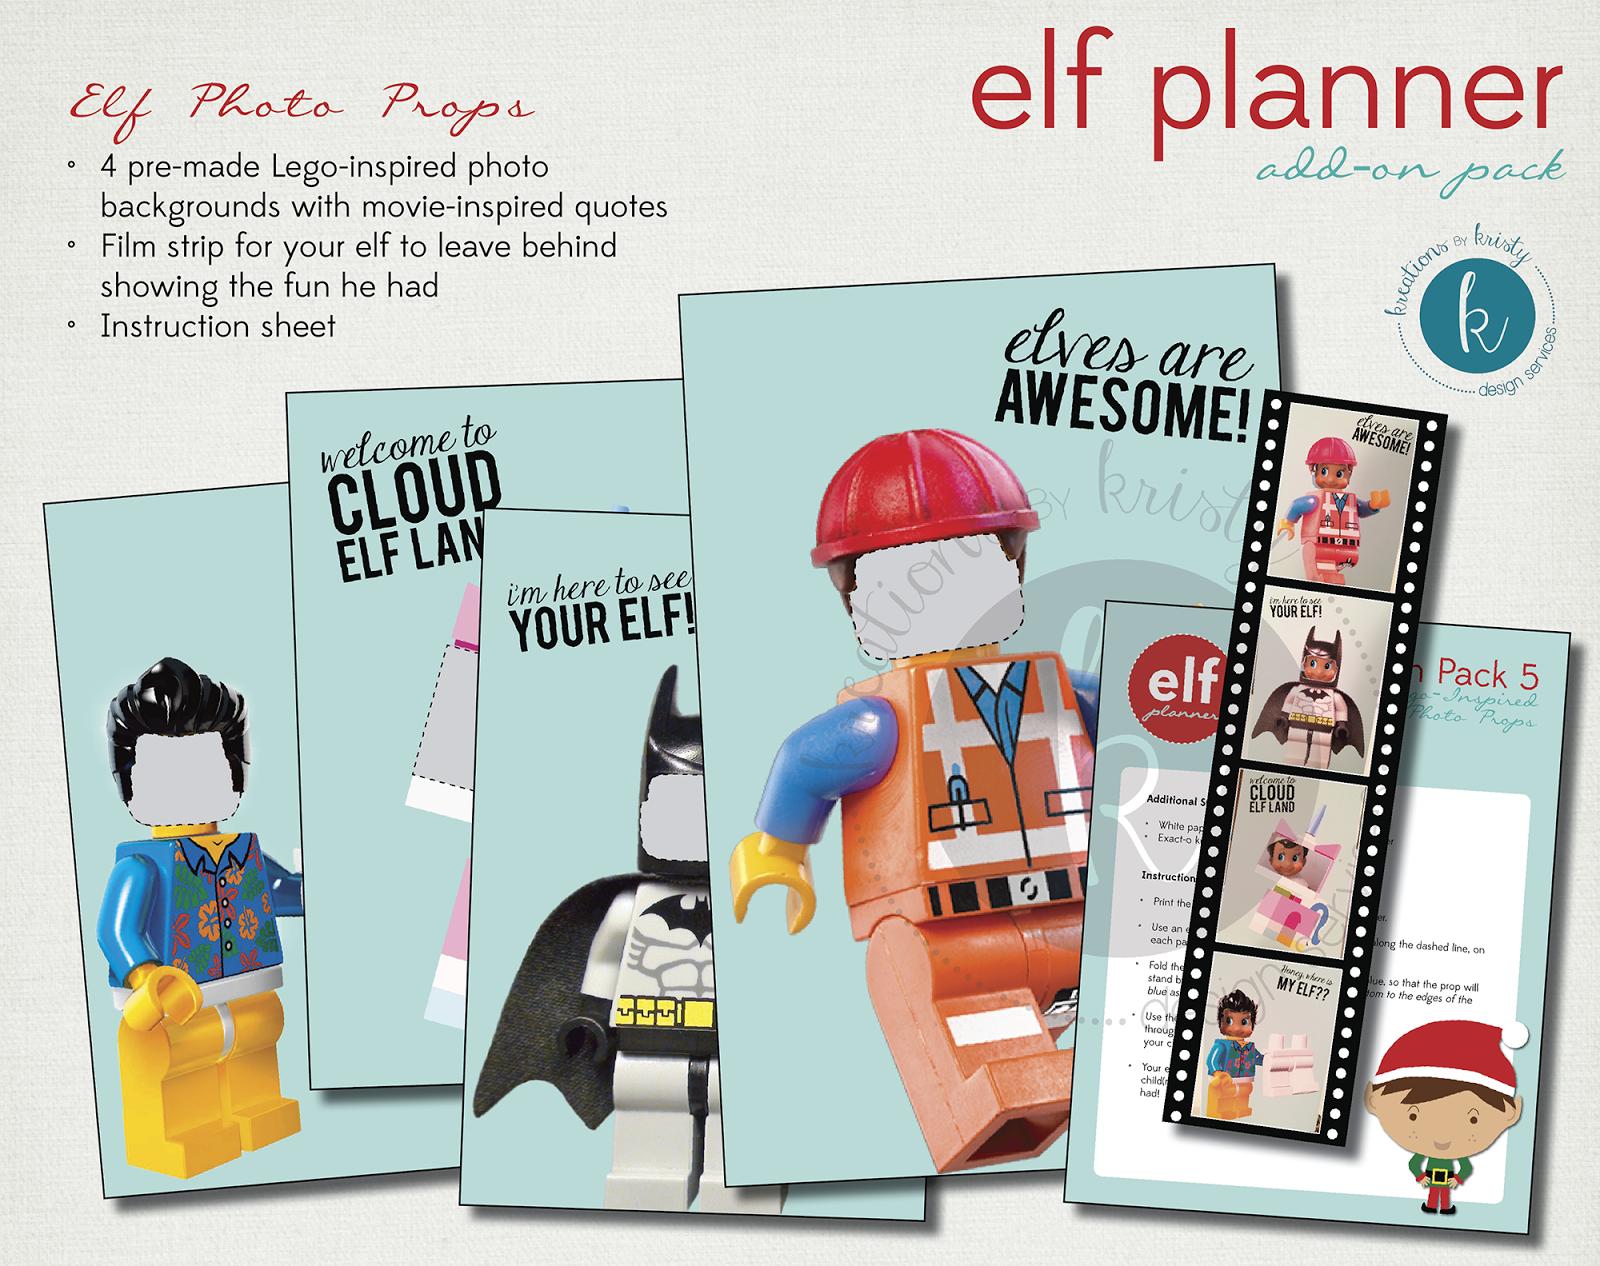 elf on the shelf free diy props - Google Search | Elf on the Shelf ...